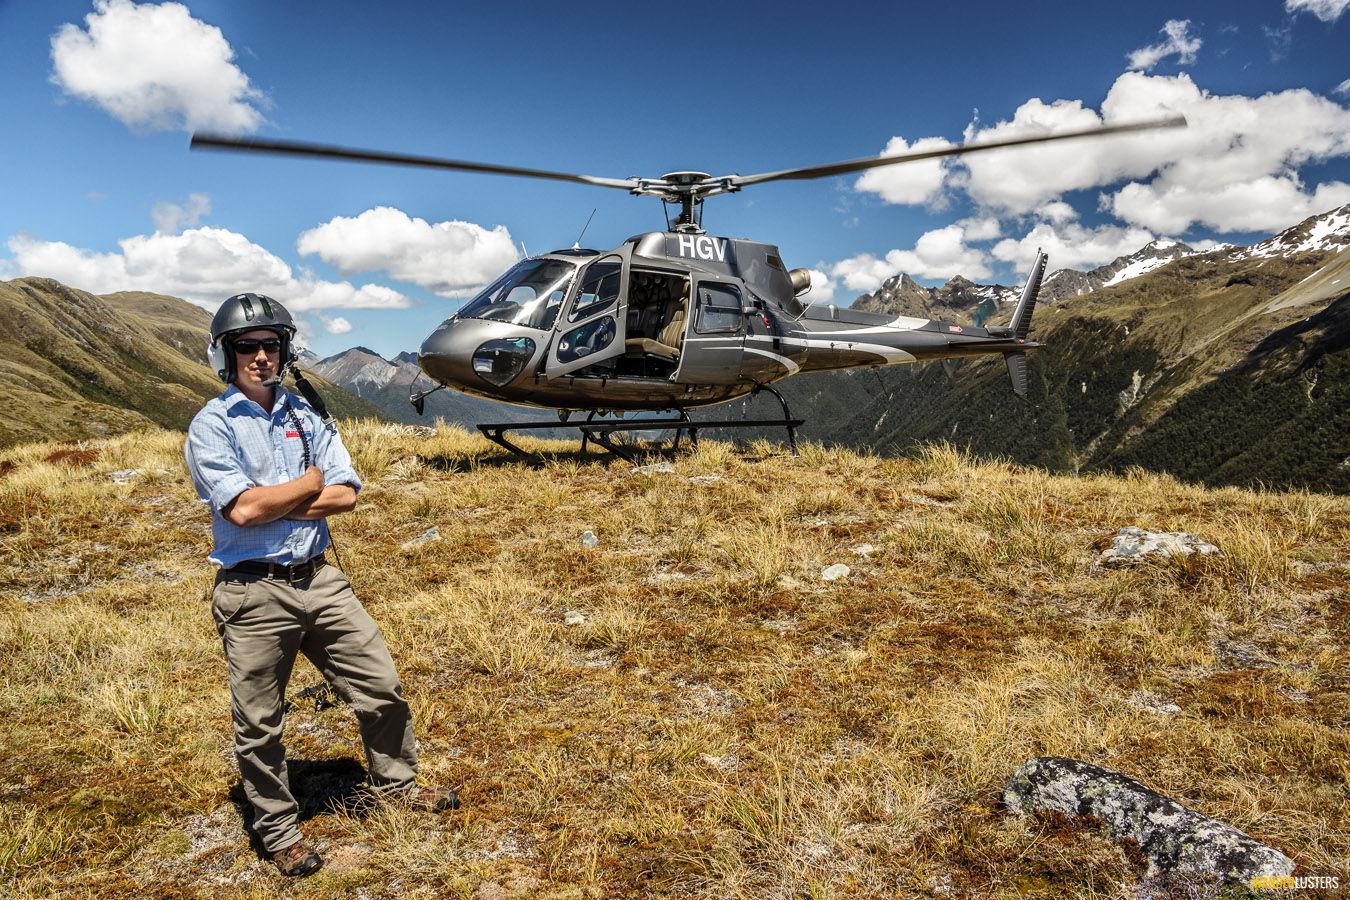 alpine escape helicopter-line-queenstown-divide-pilot